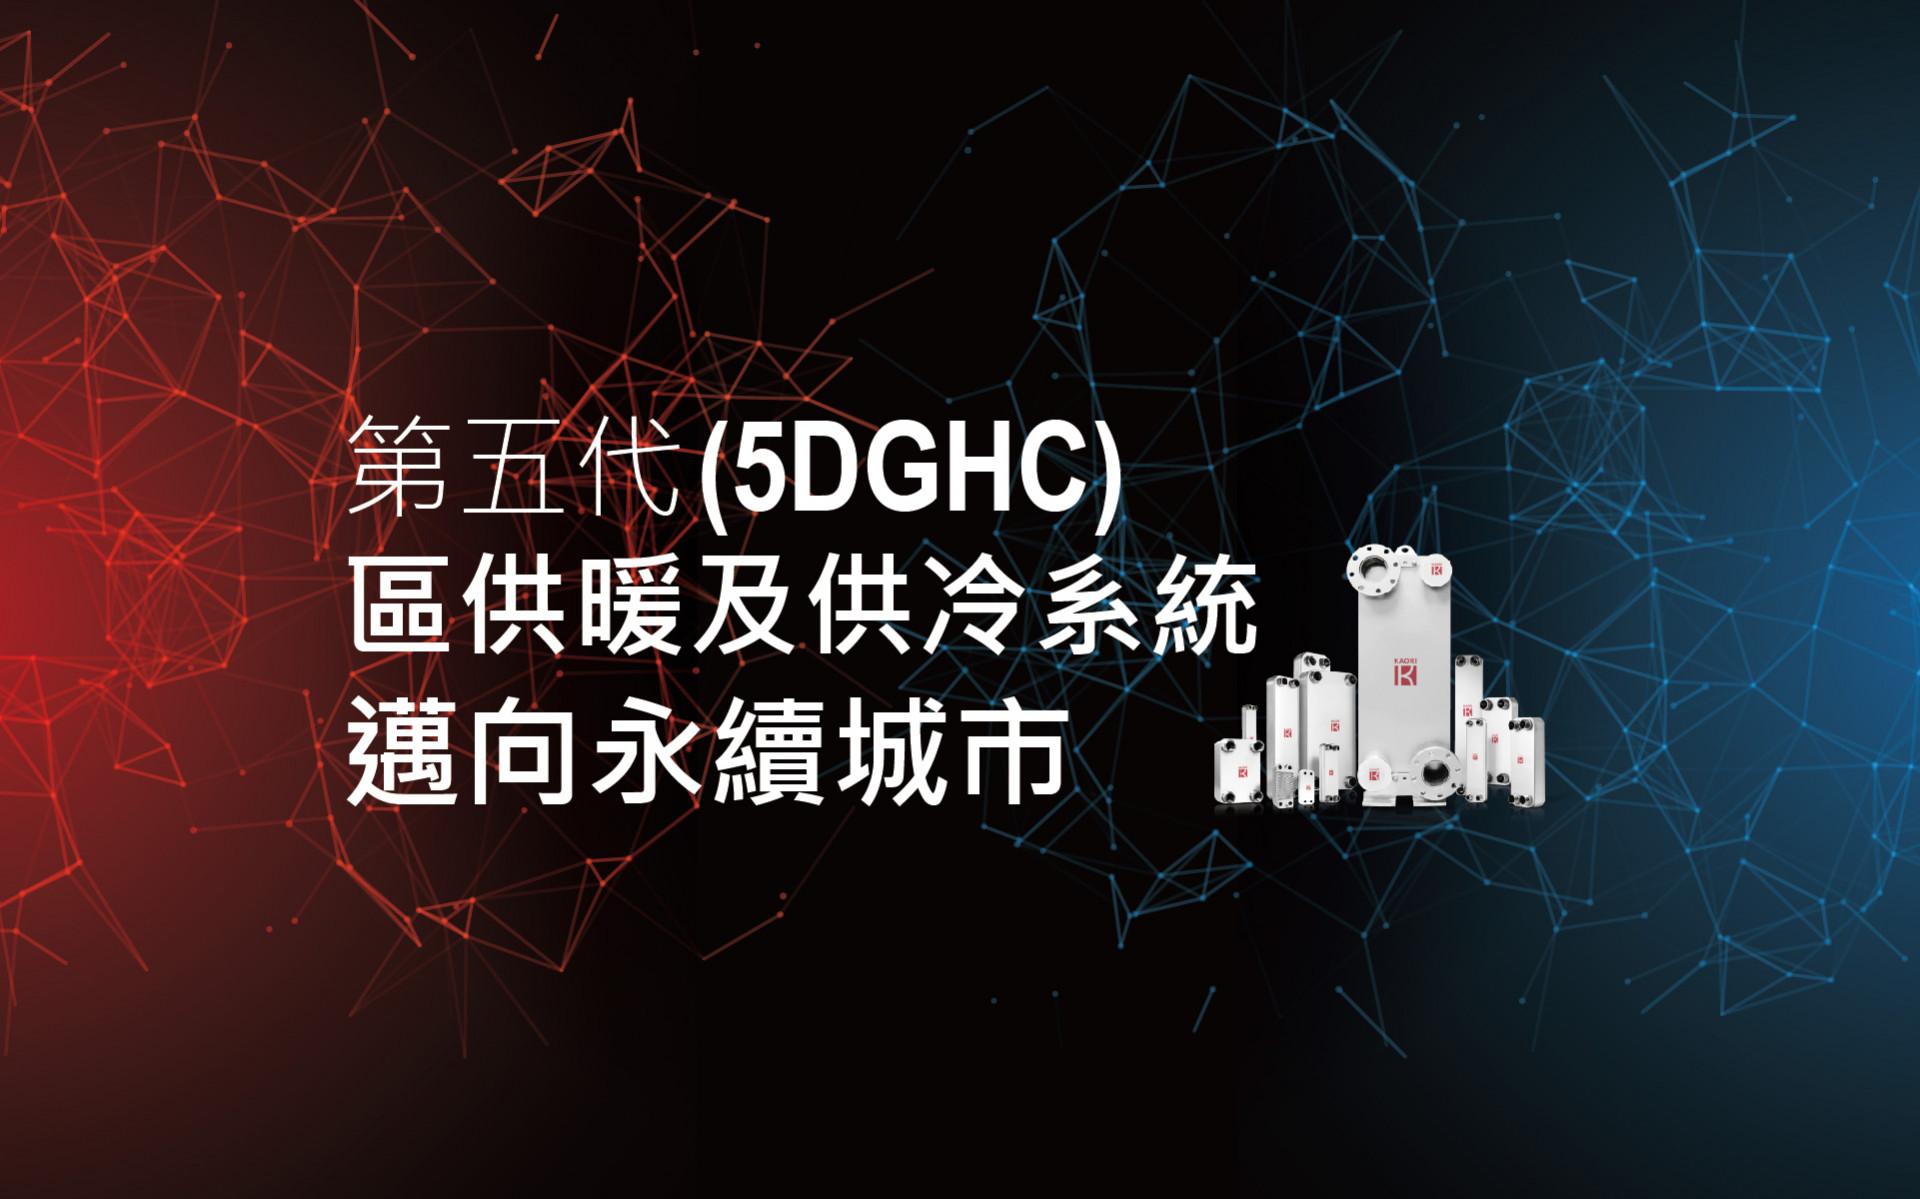 5GDHC 第五代區供暖及供冷系統,邁向永續城市